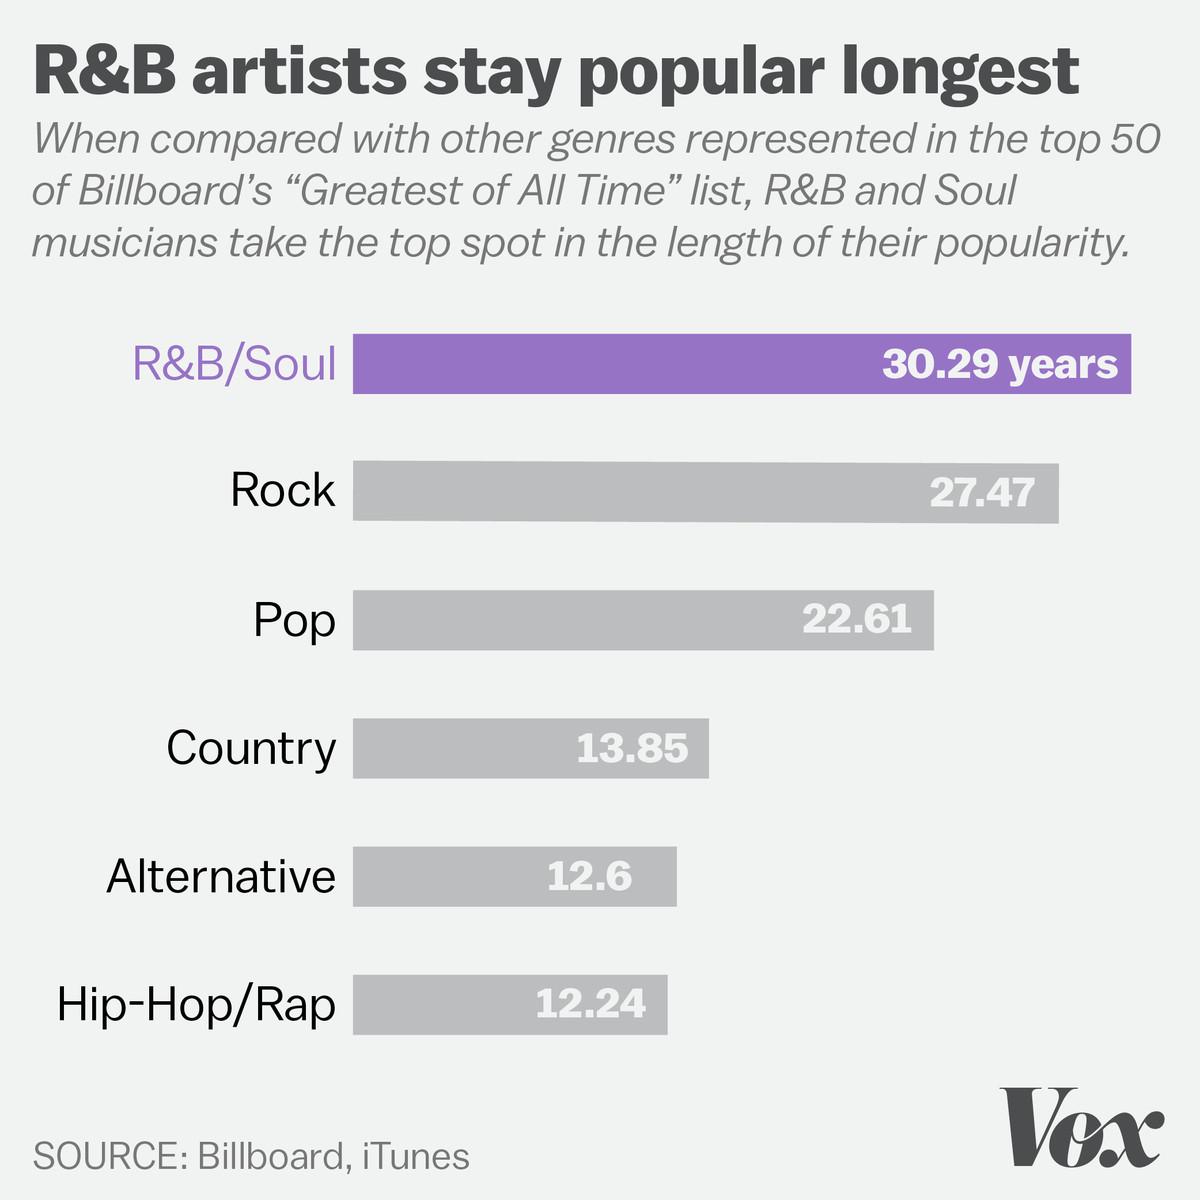 R&B artists stay popular longest